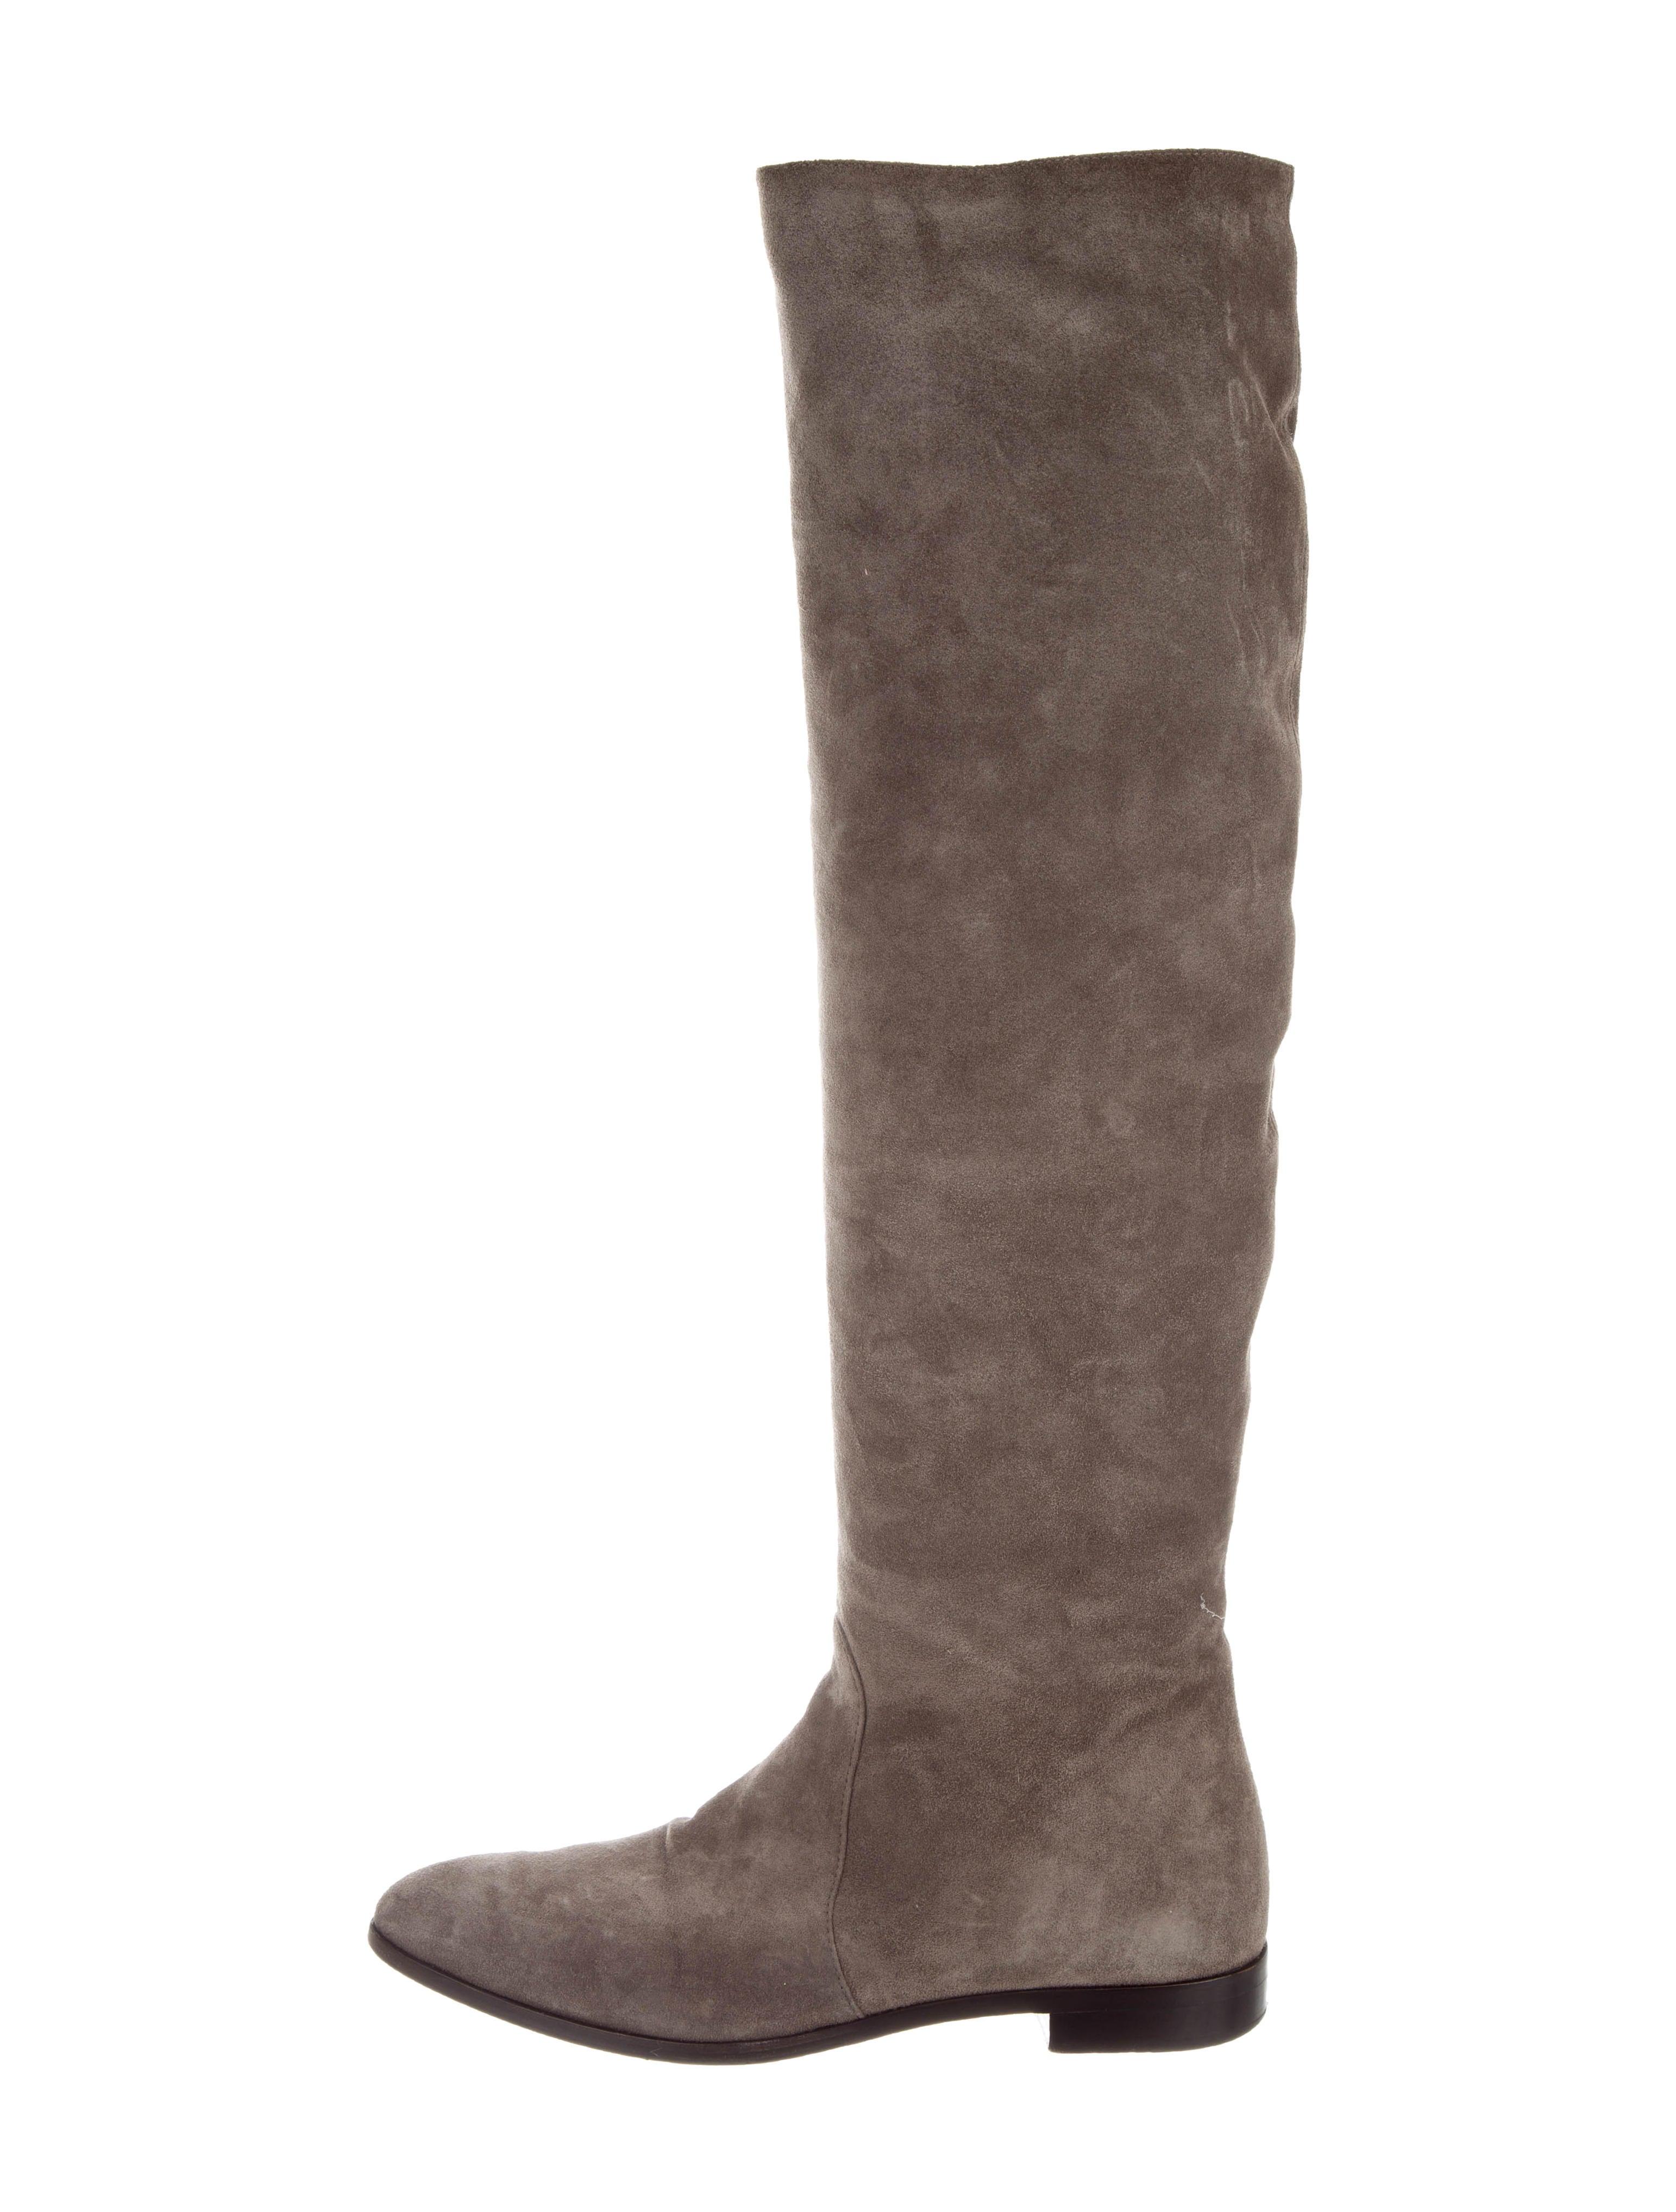 48aadf00da2 Prada Suede Over-The-Knee Boots - Shoes - PRA186569